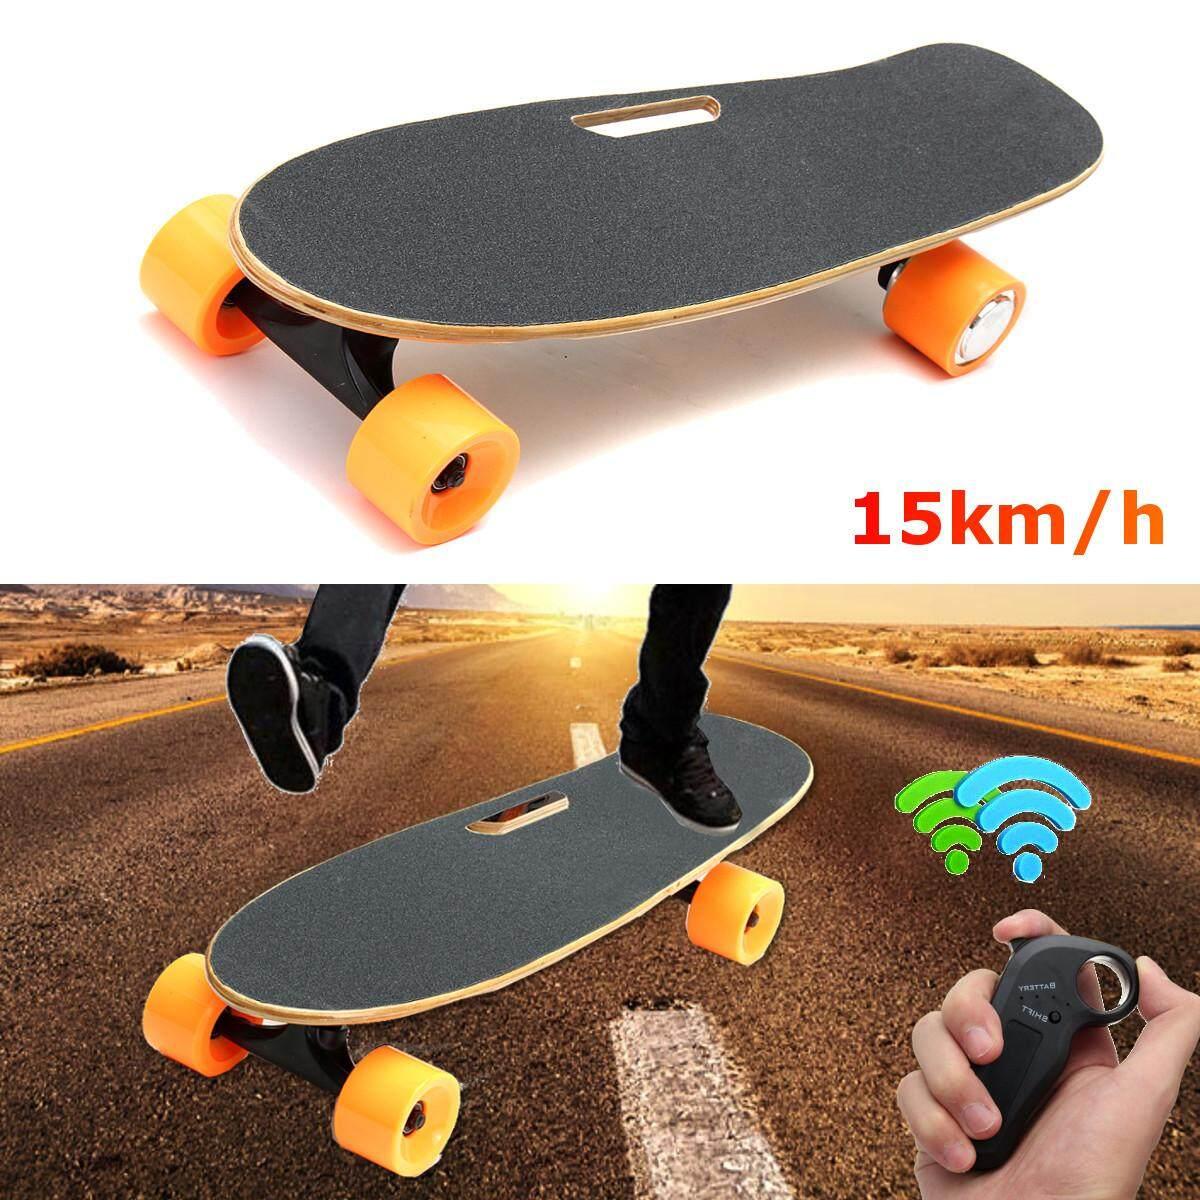 b95efdaf9a  Free Shipping + Flash Deal New Electric Longboard Skateboard 4 Wheels  Wireless Remote Control